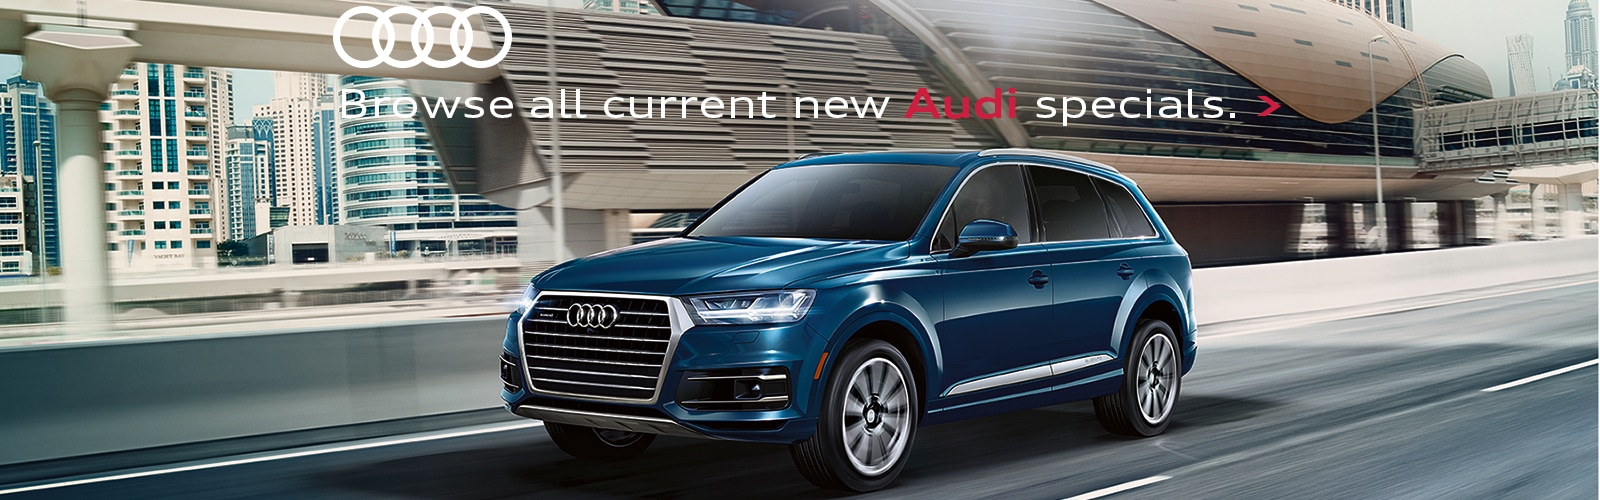 New Audi Used Luxury Cars SUVs Near Portland Audi A A A - Wilsonville audi